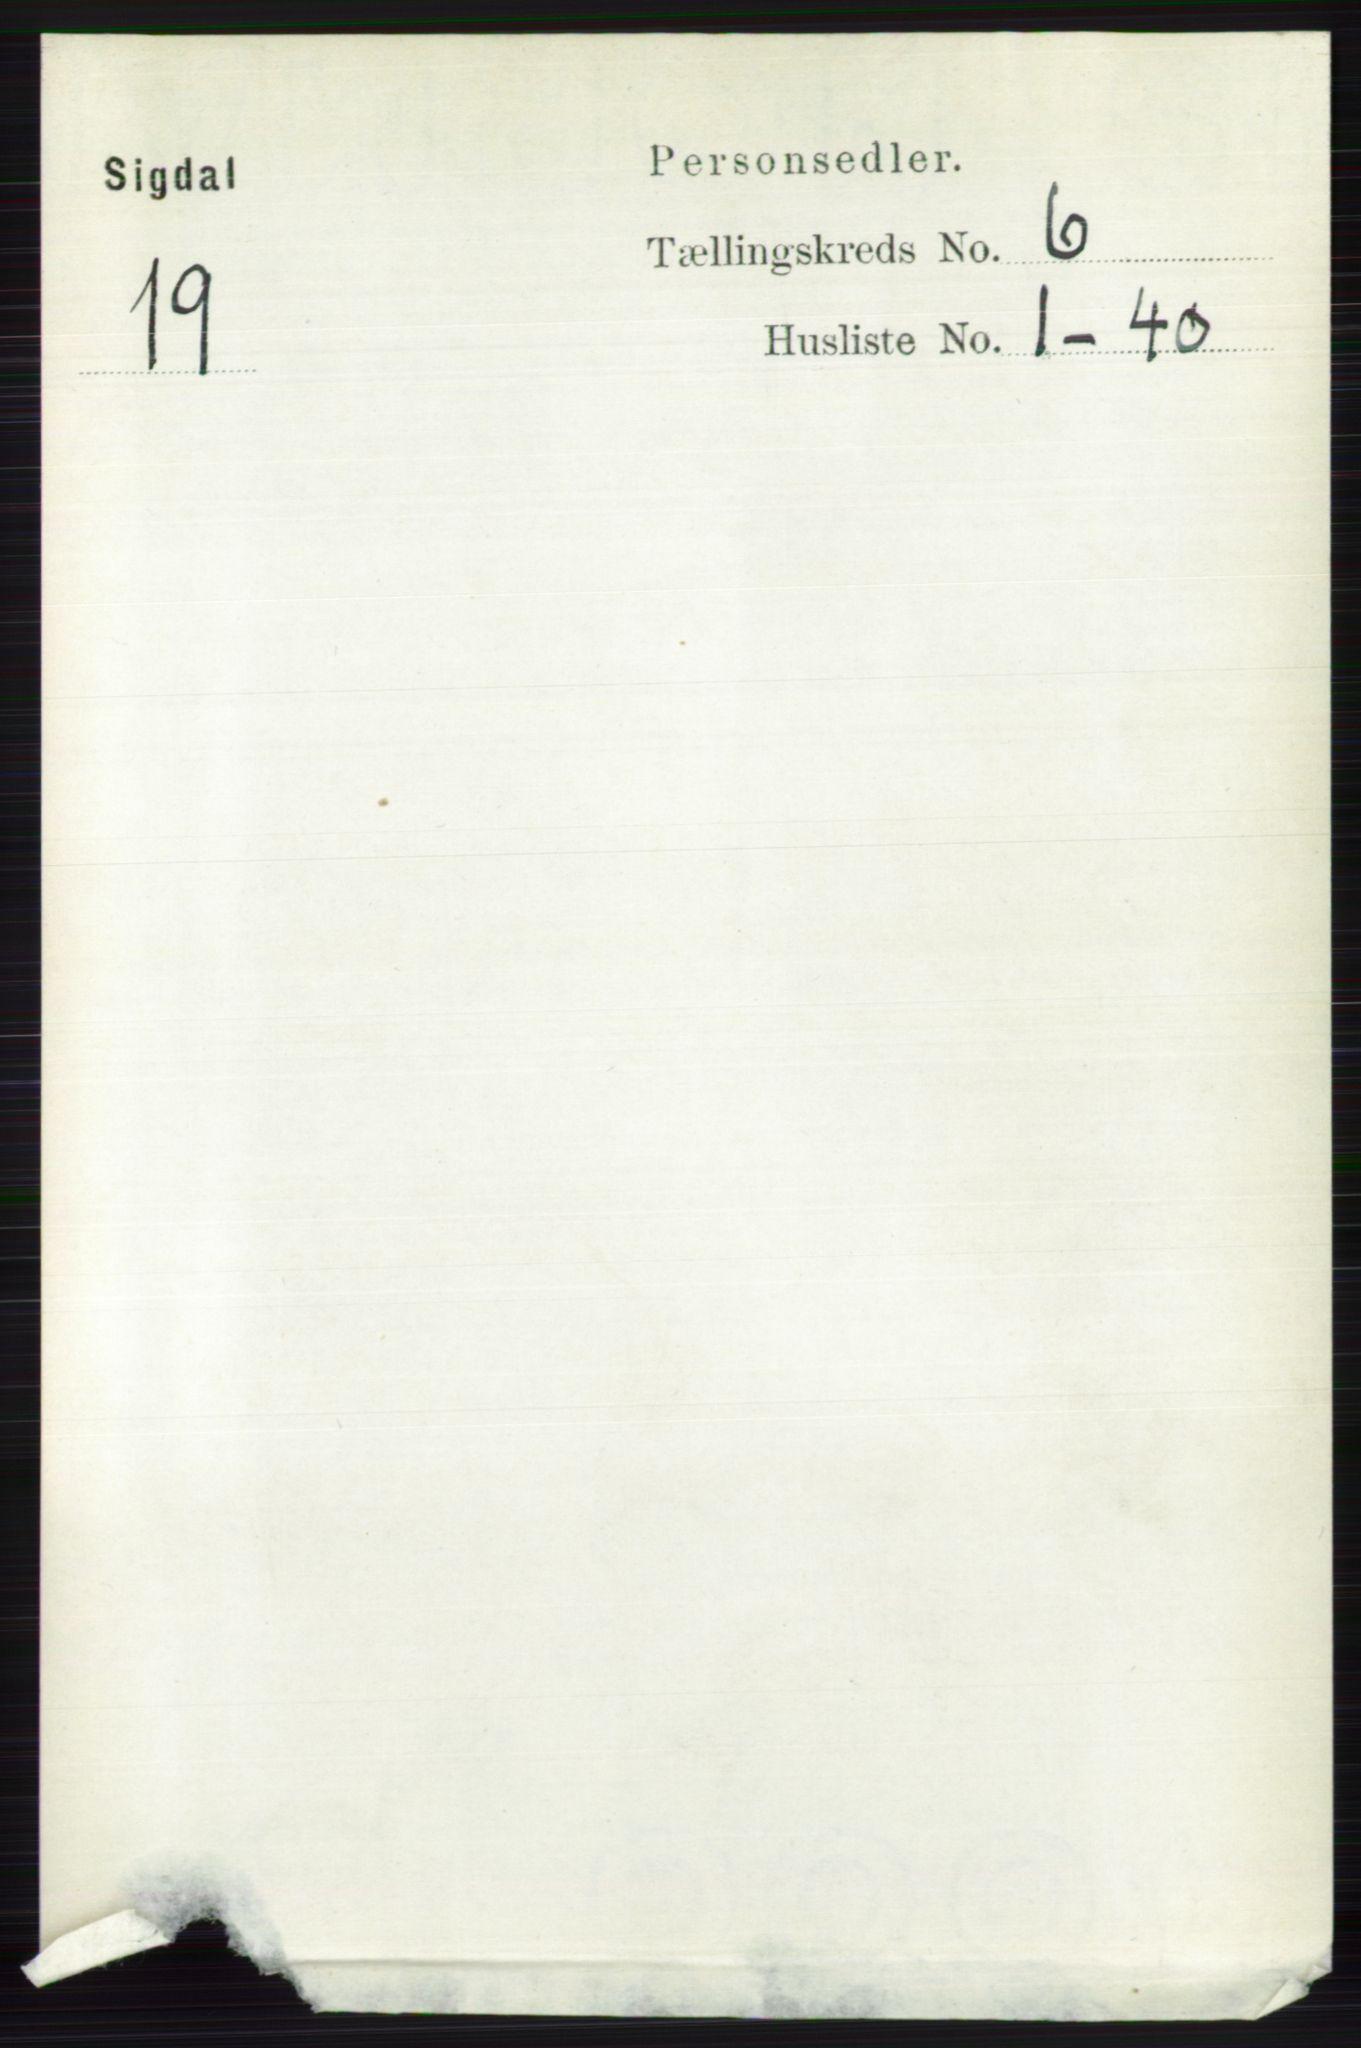 RA, Folketelling 1891 for 0621 Sigdal herred, 1891, s. 2422